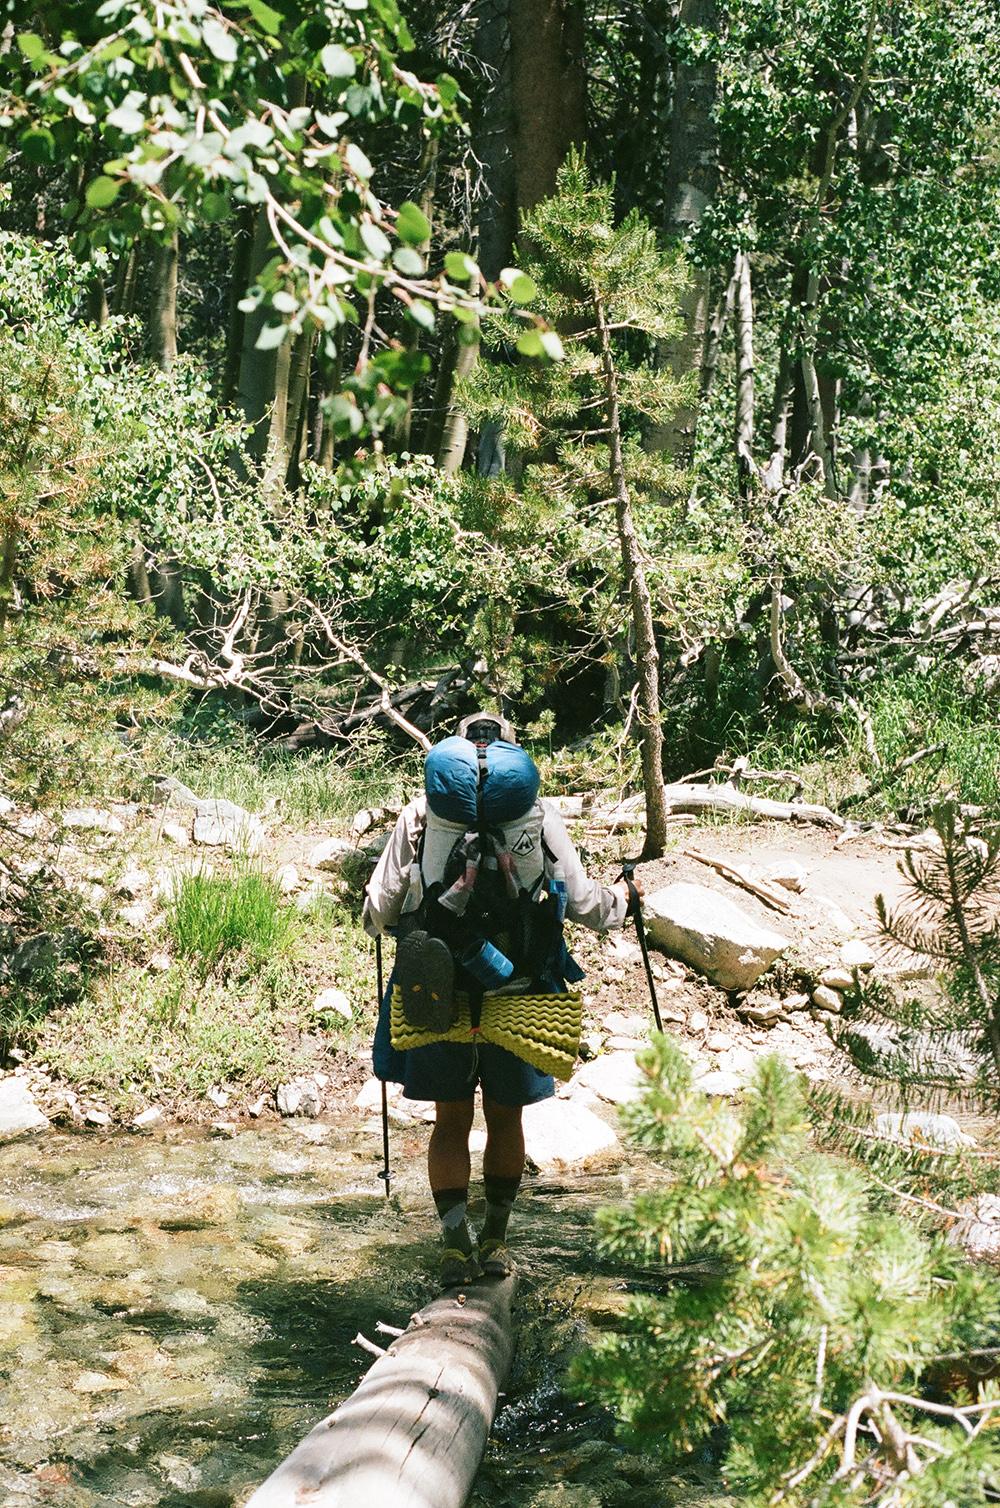 Owen heading into a river crossing, 35mm film